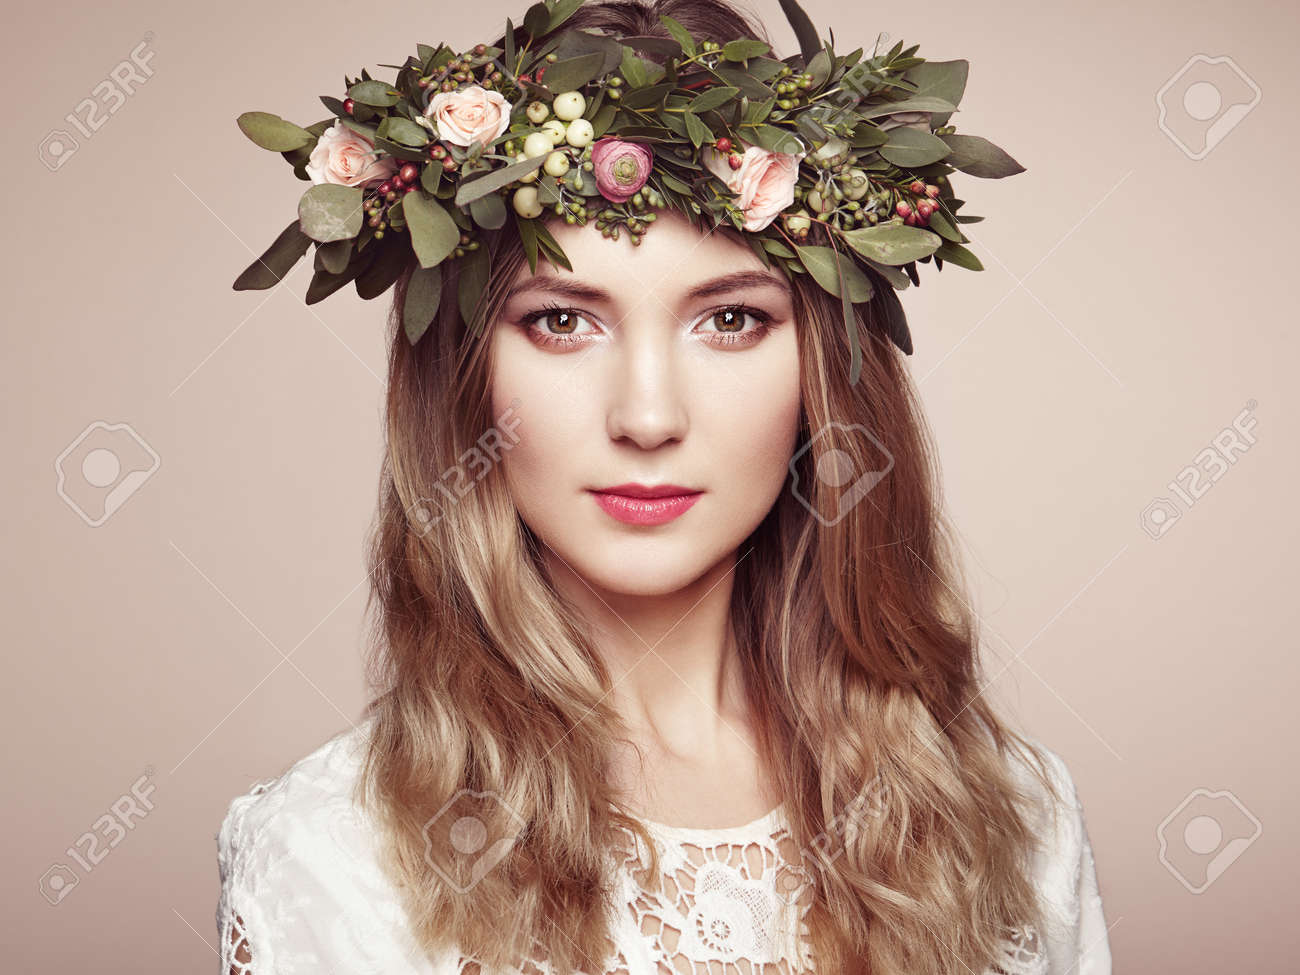 Beautiful blonde woman with flower wreath on her head beauty beautiful blonde woman with flower wreath on her head beauty girl with flowers hairstyle izmirmasajfo